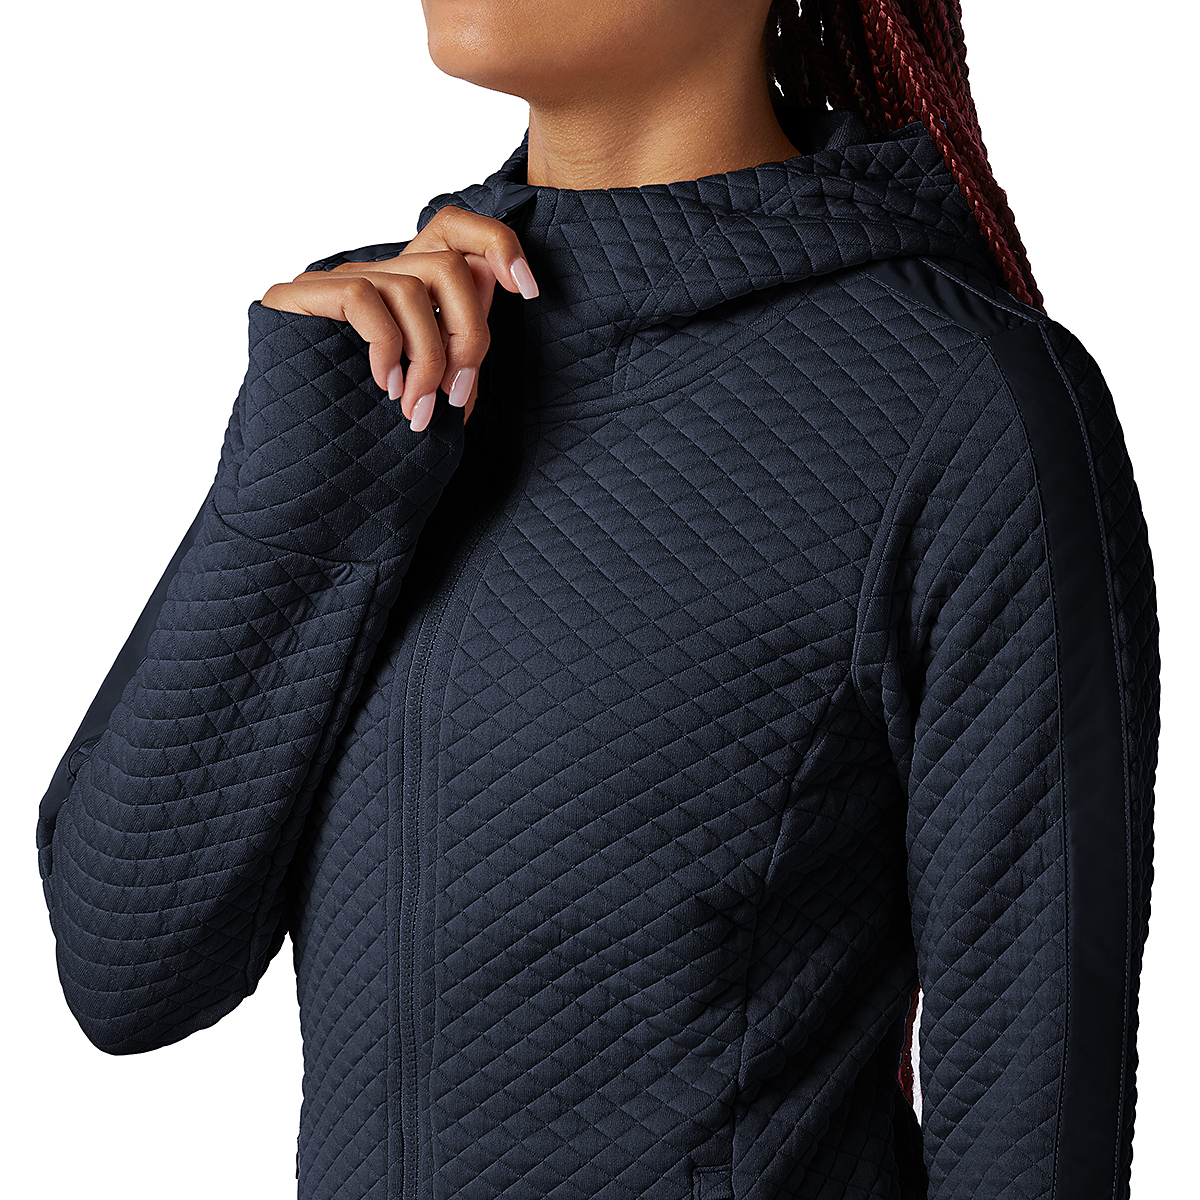 Women's New Balance Heatloft Jacket - Color: Eclipse Heather - Size: XS, Eclipse Heather, large, image 4